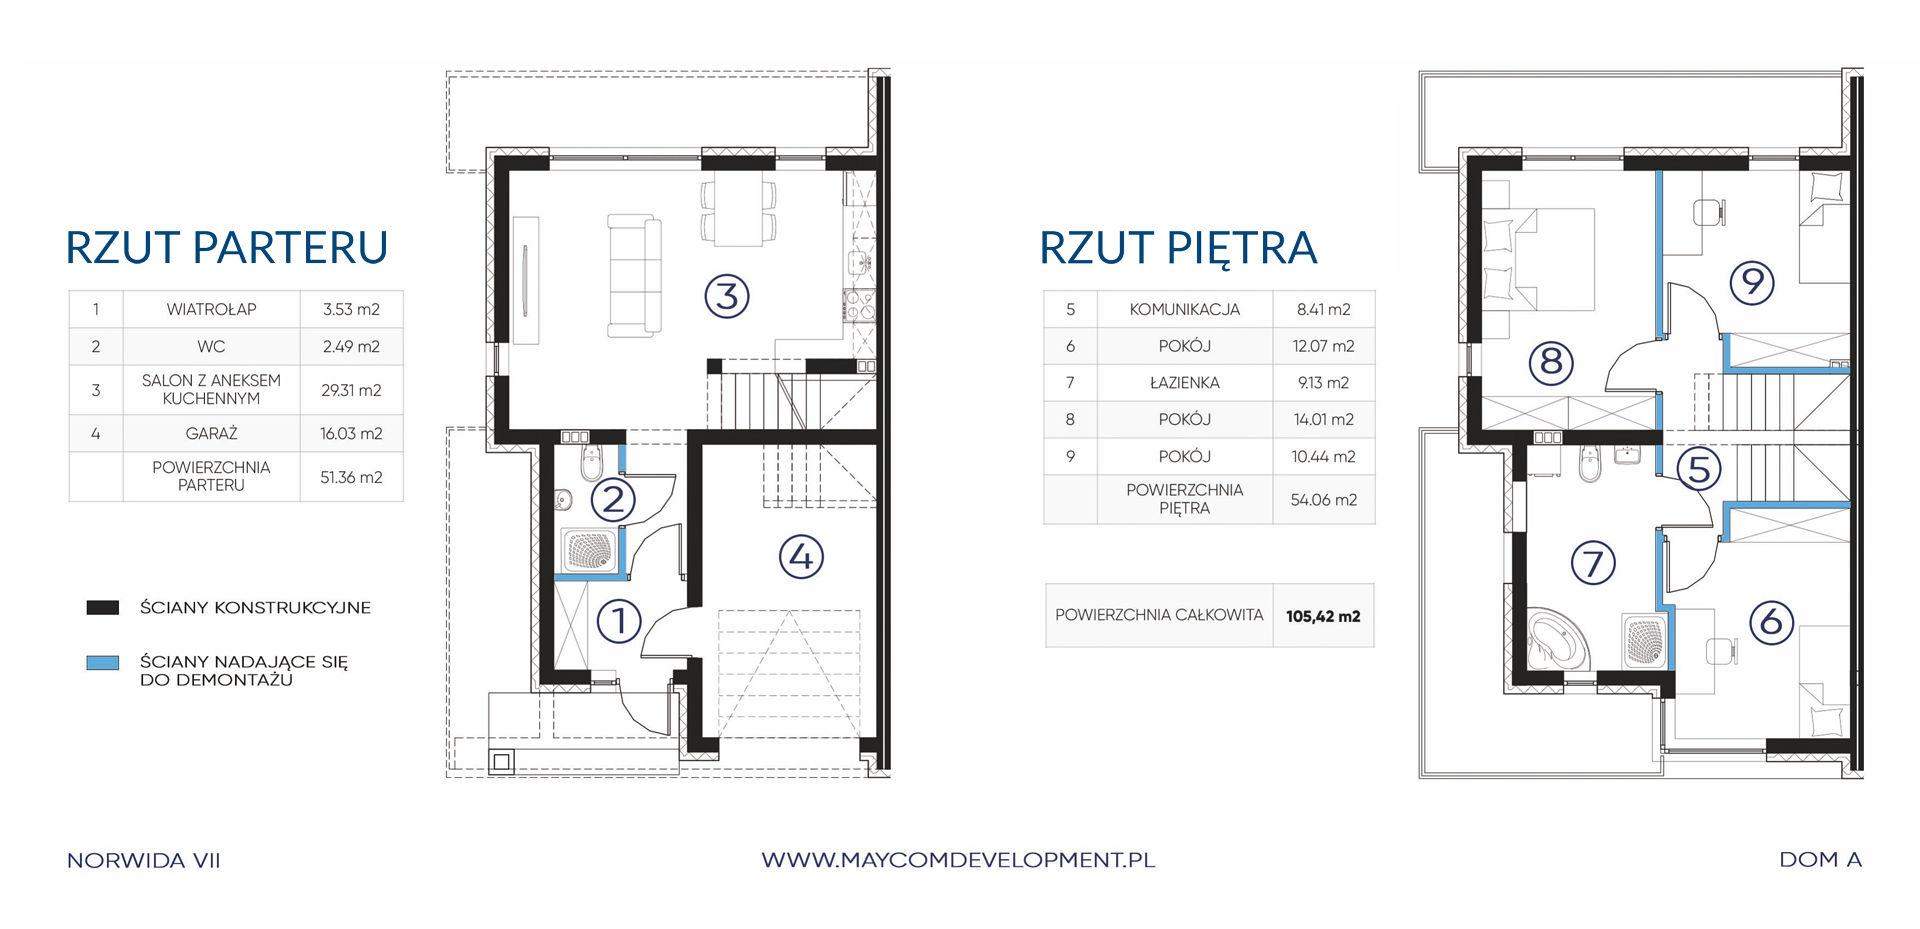 Dom A parter i piętro - NORWIDA VII